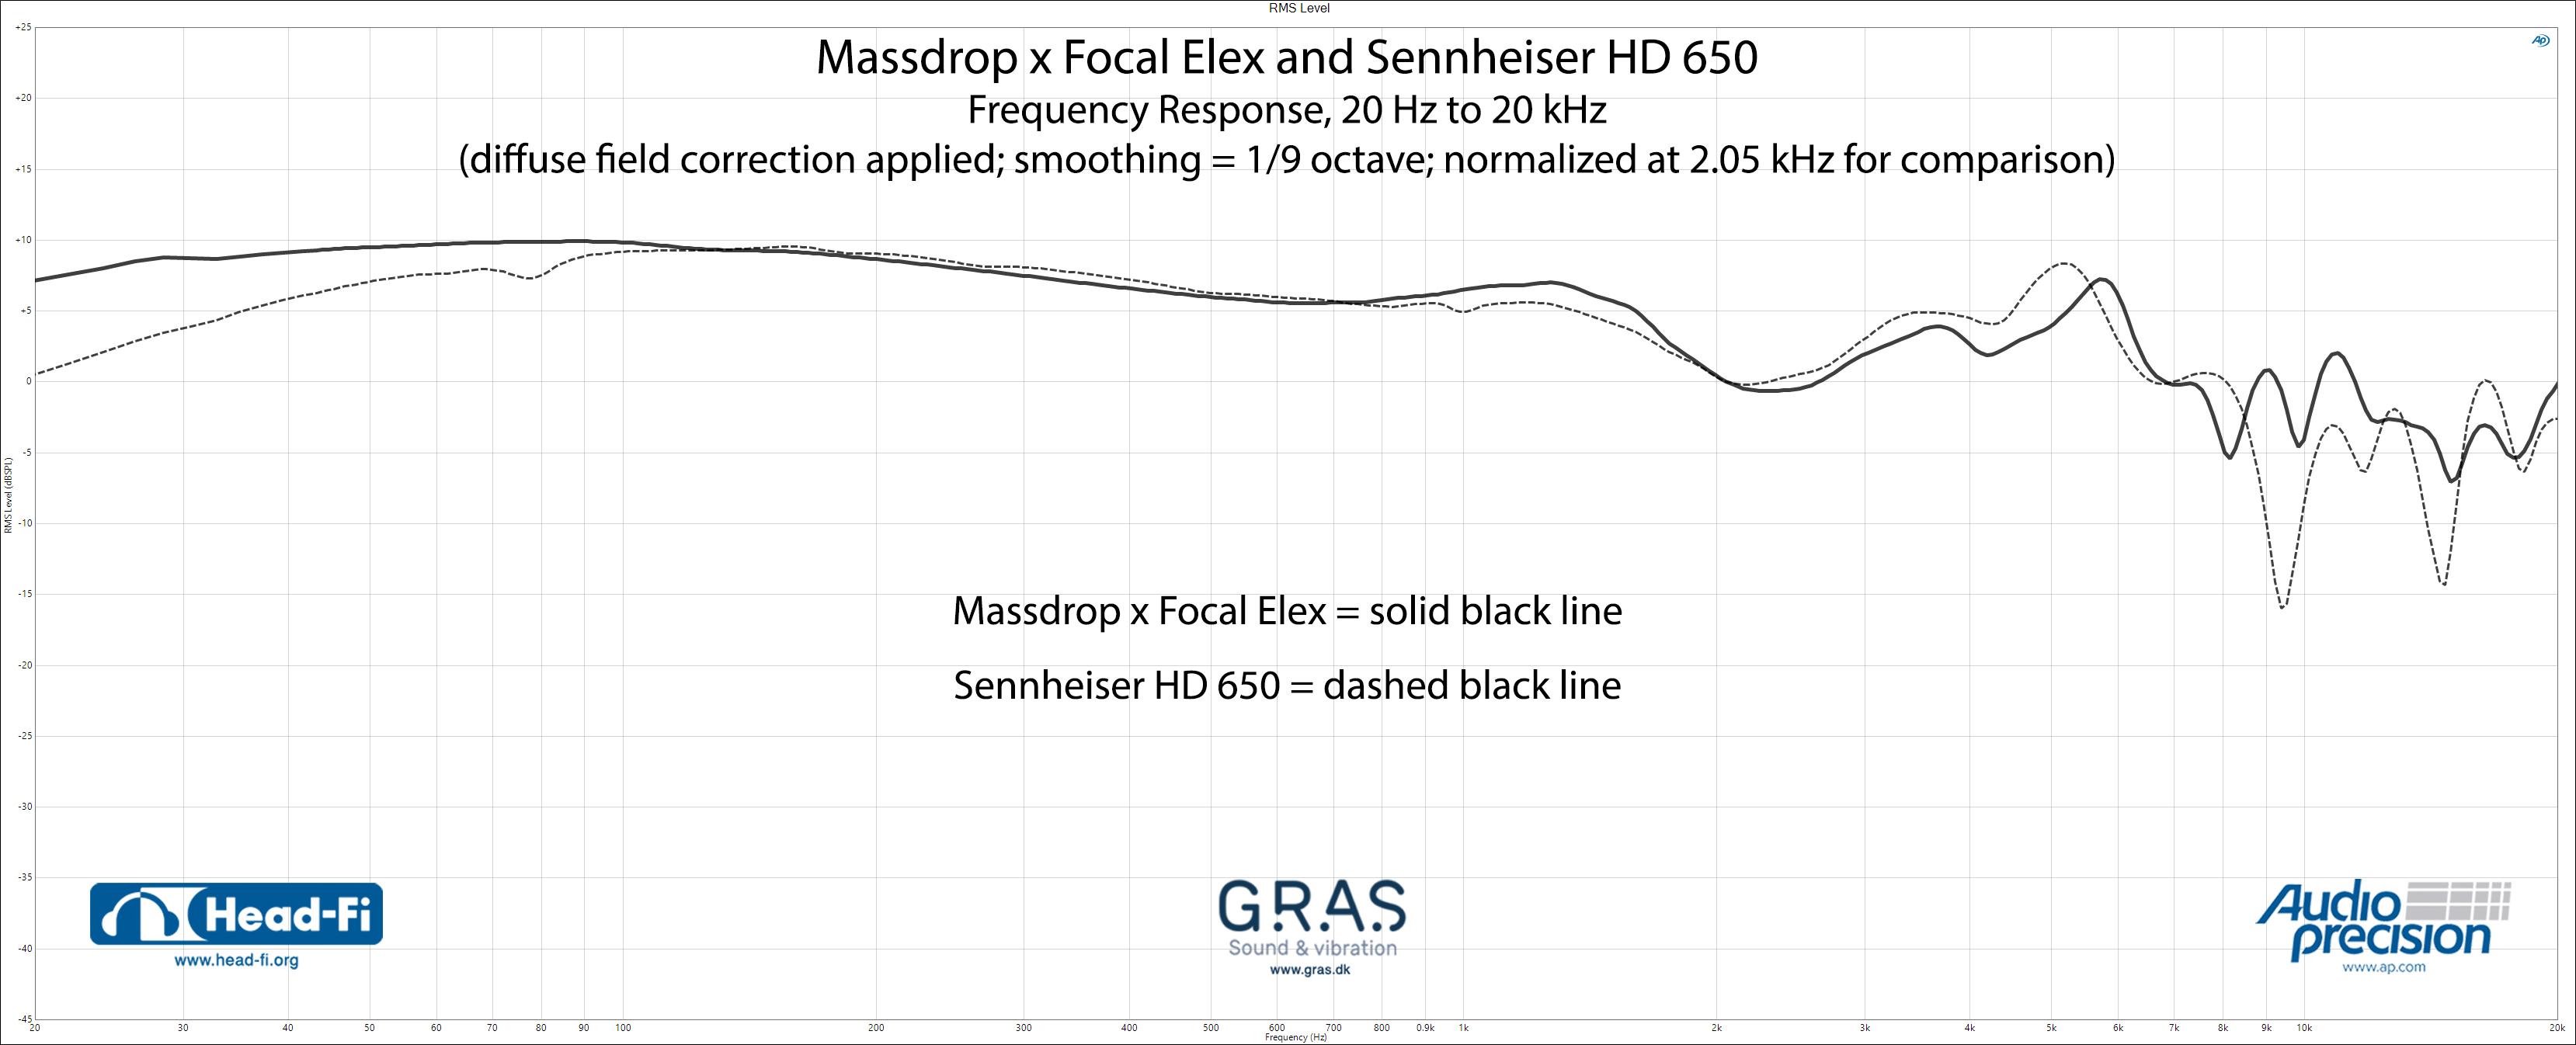 RMS-Level_1-9_DF_Normalize-2.05-kHz_Massdrop-x-Focal-Elex_Sennheiser-HD650.jpg